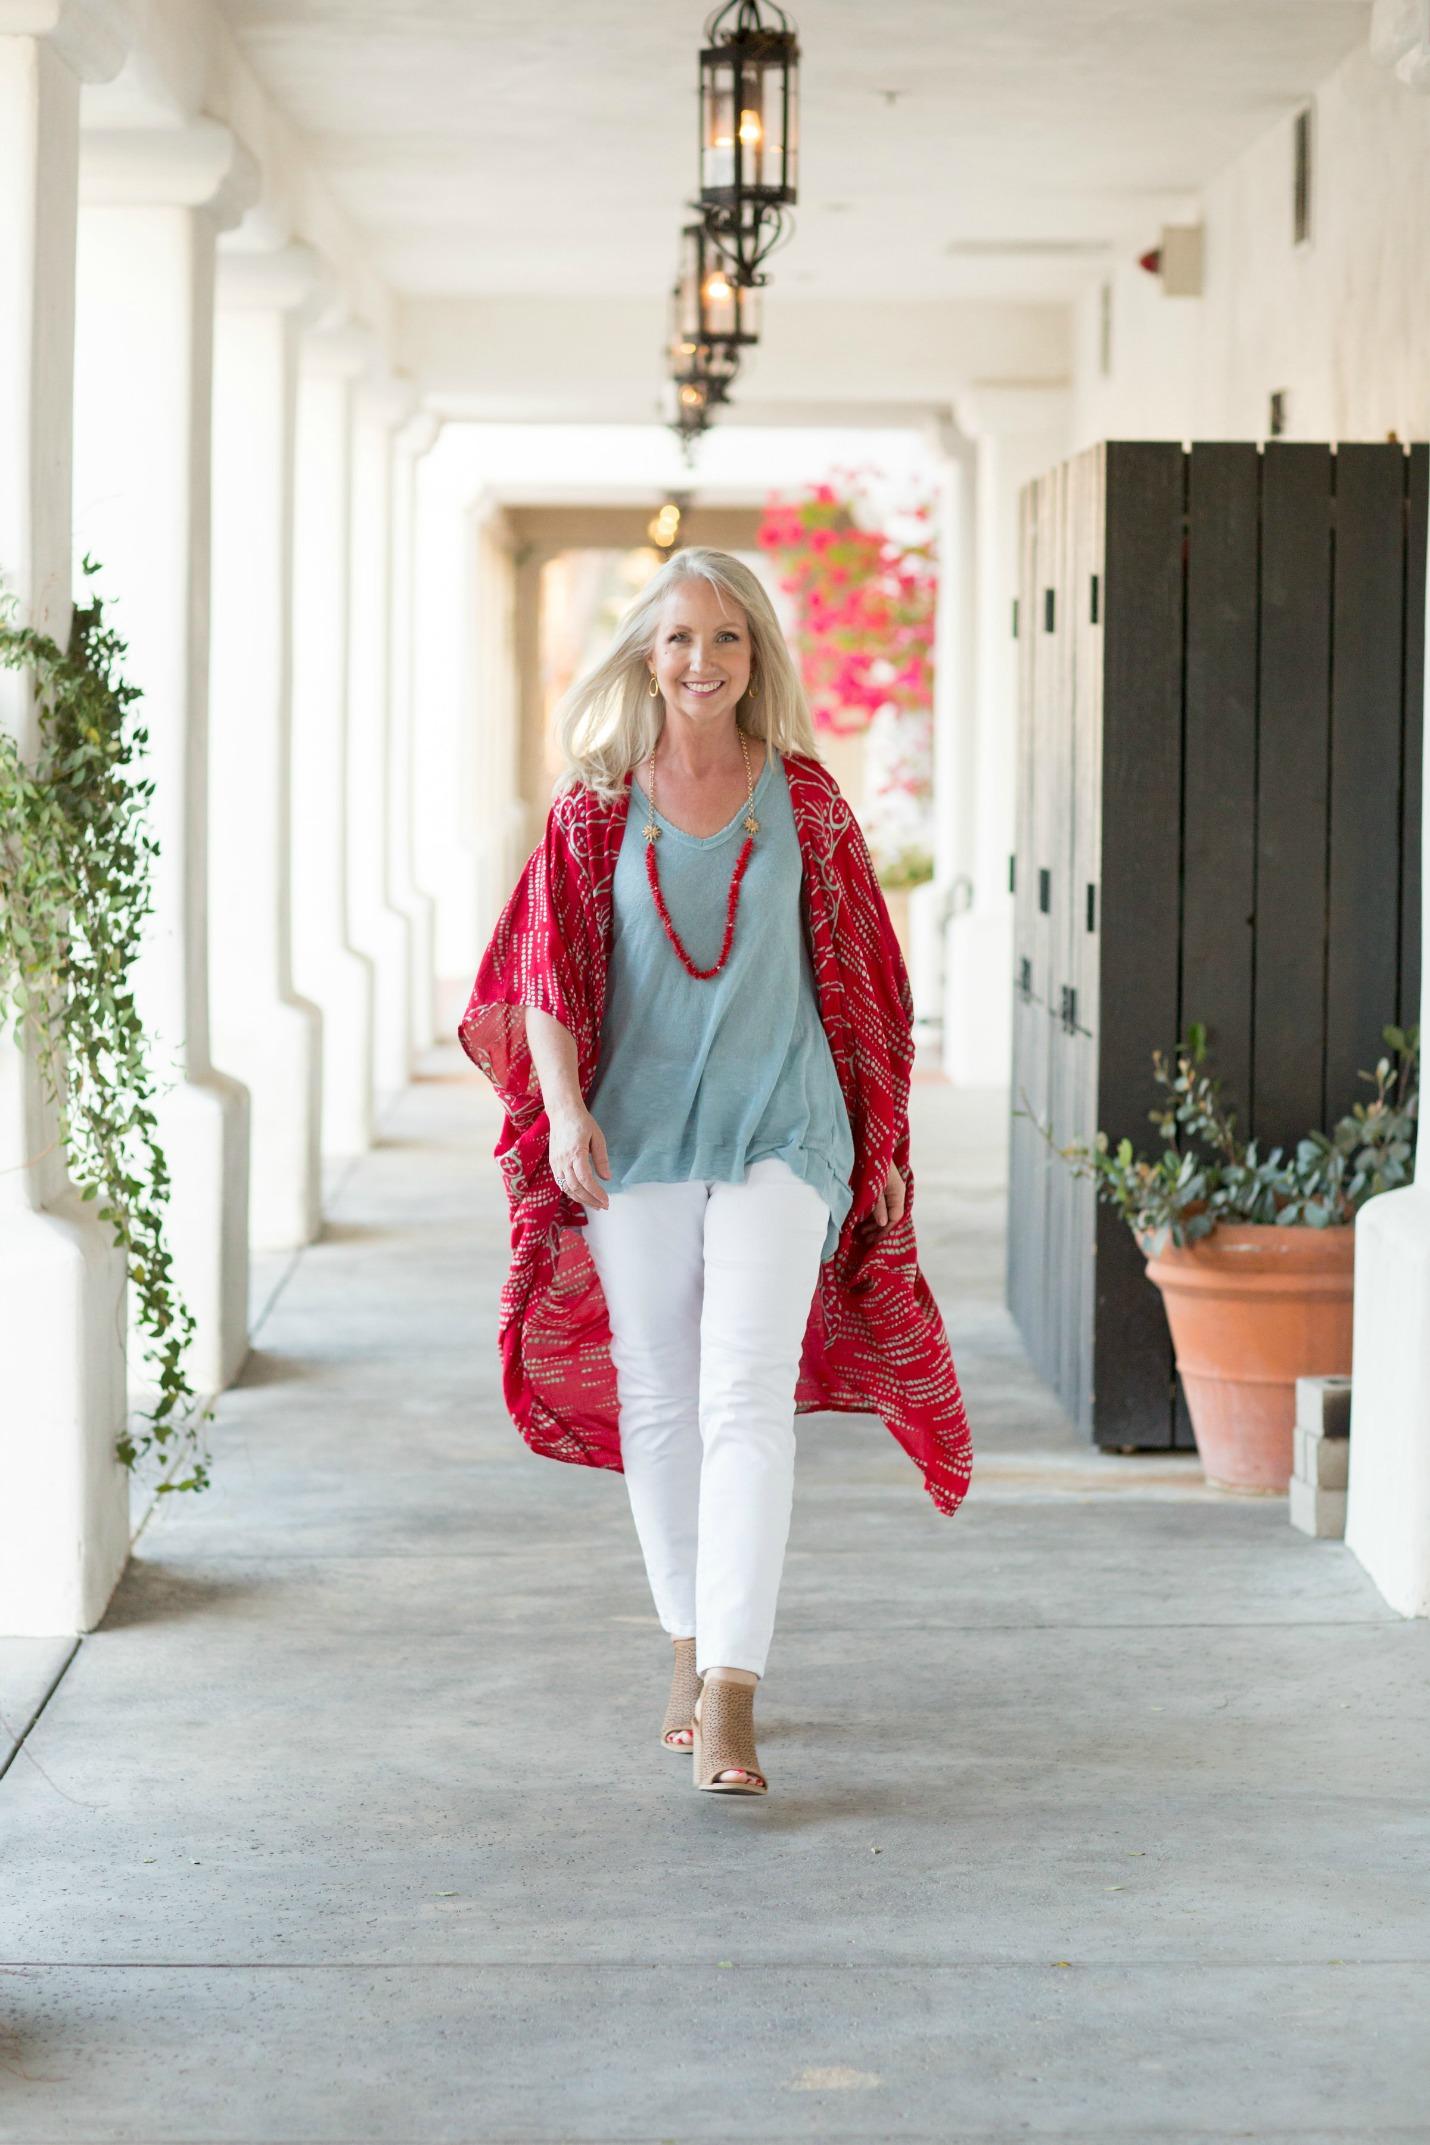 Kimono Red Aqua Top White Jeans 9